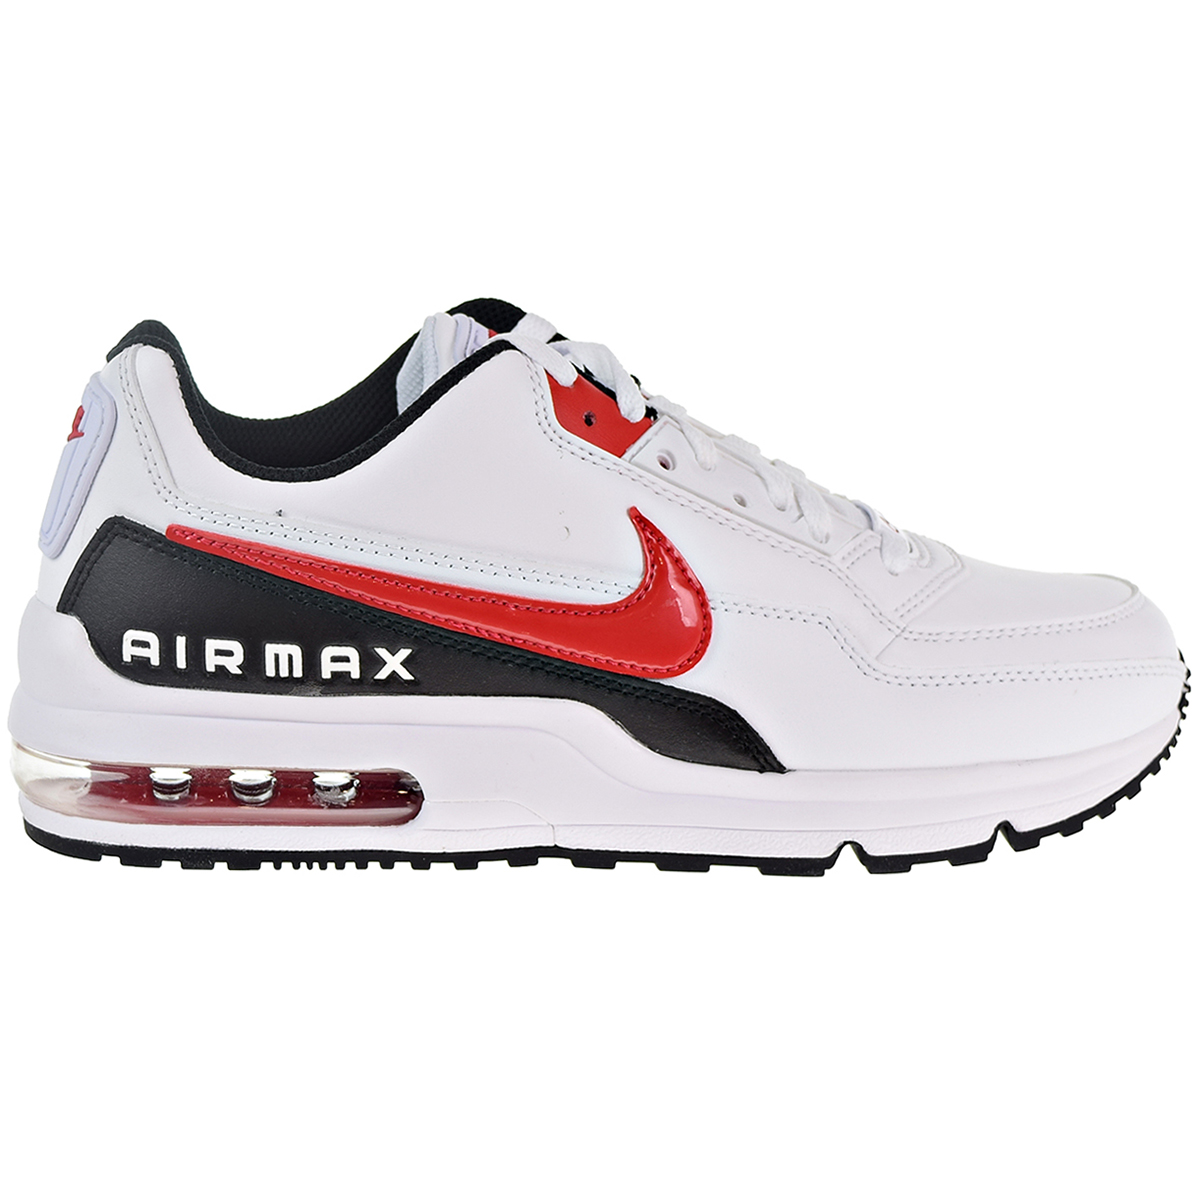 Nike Air Max LTD 3 Sneaker weiß schwarz rot BV1171 100